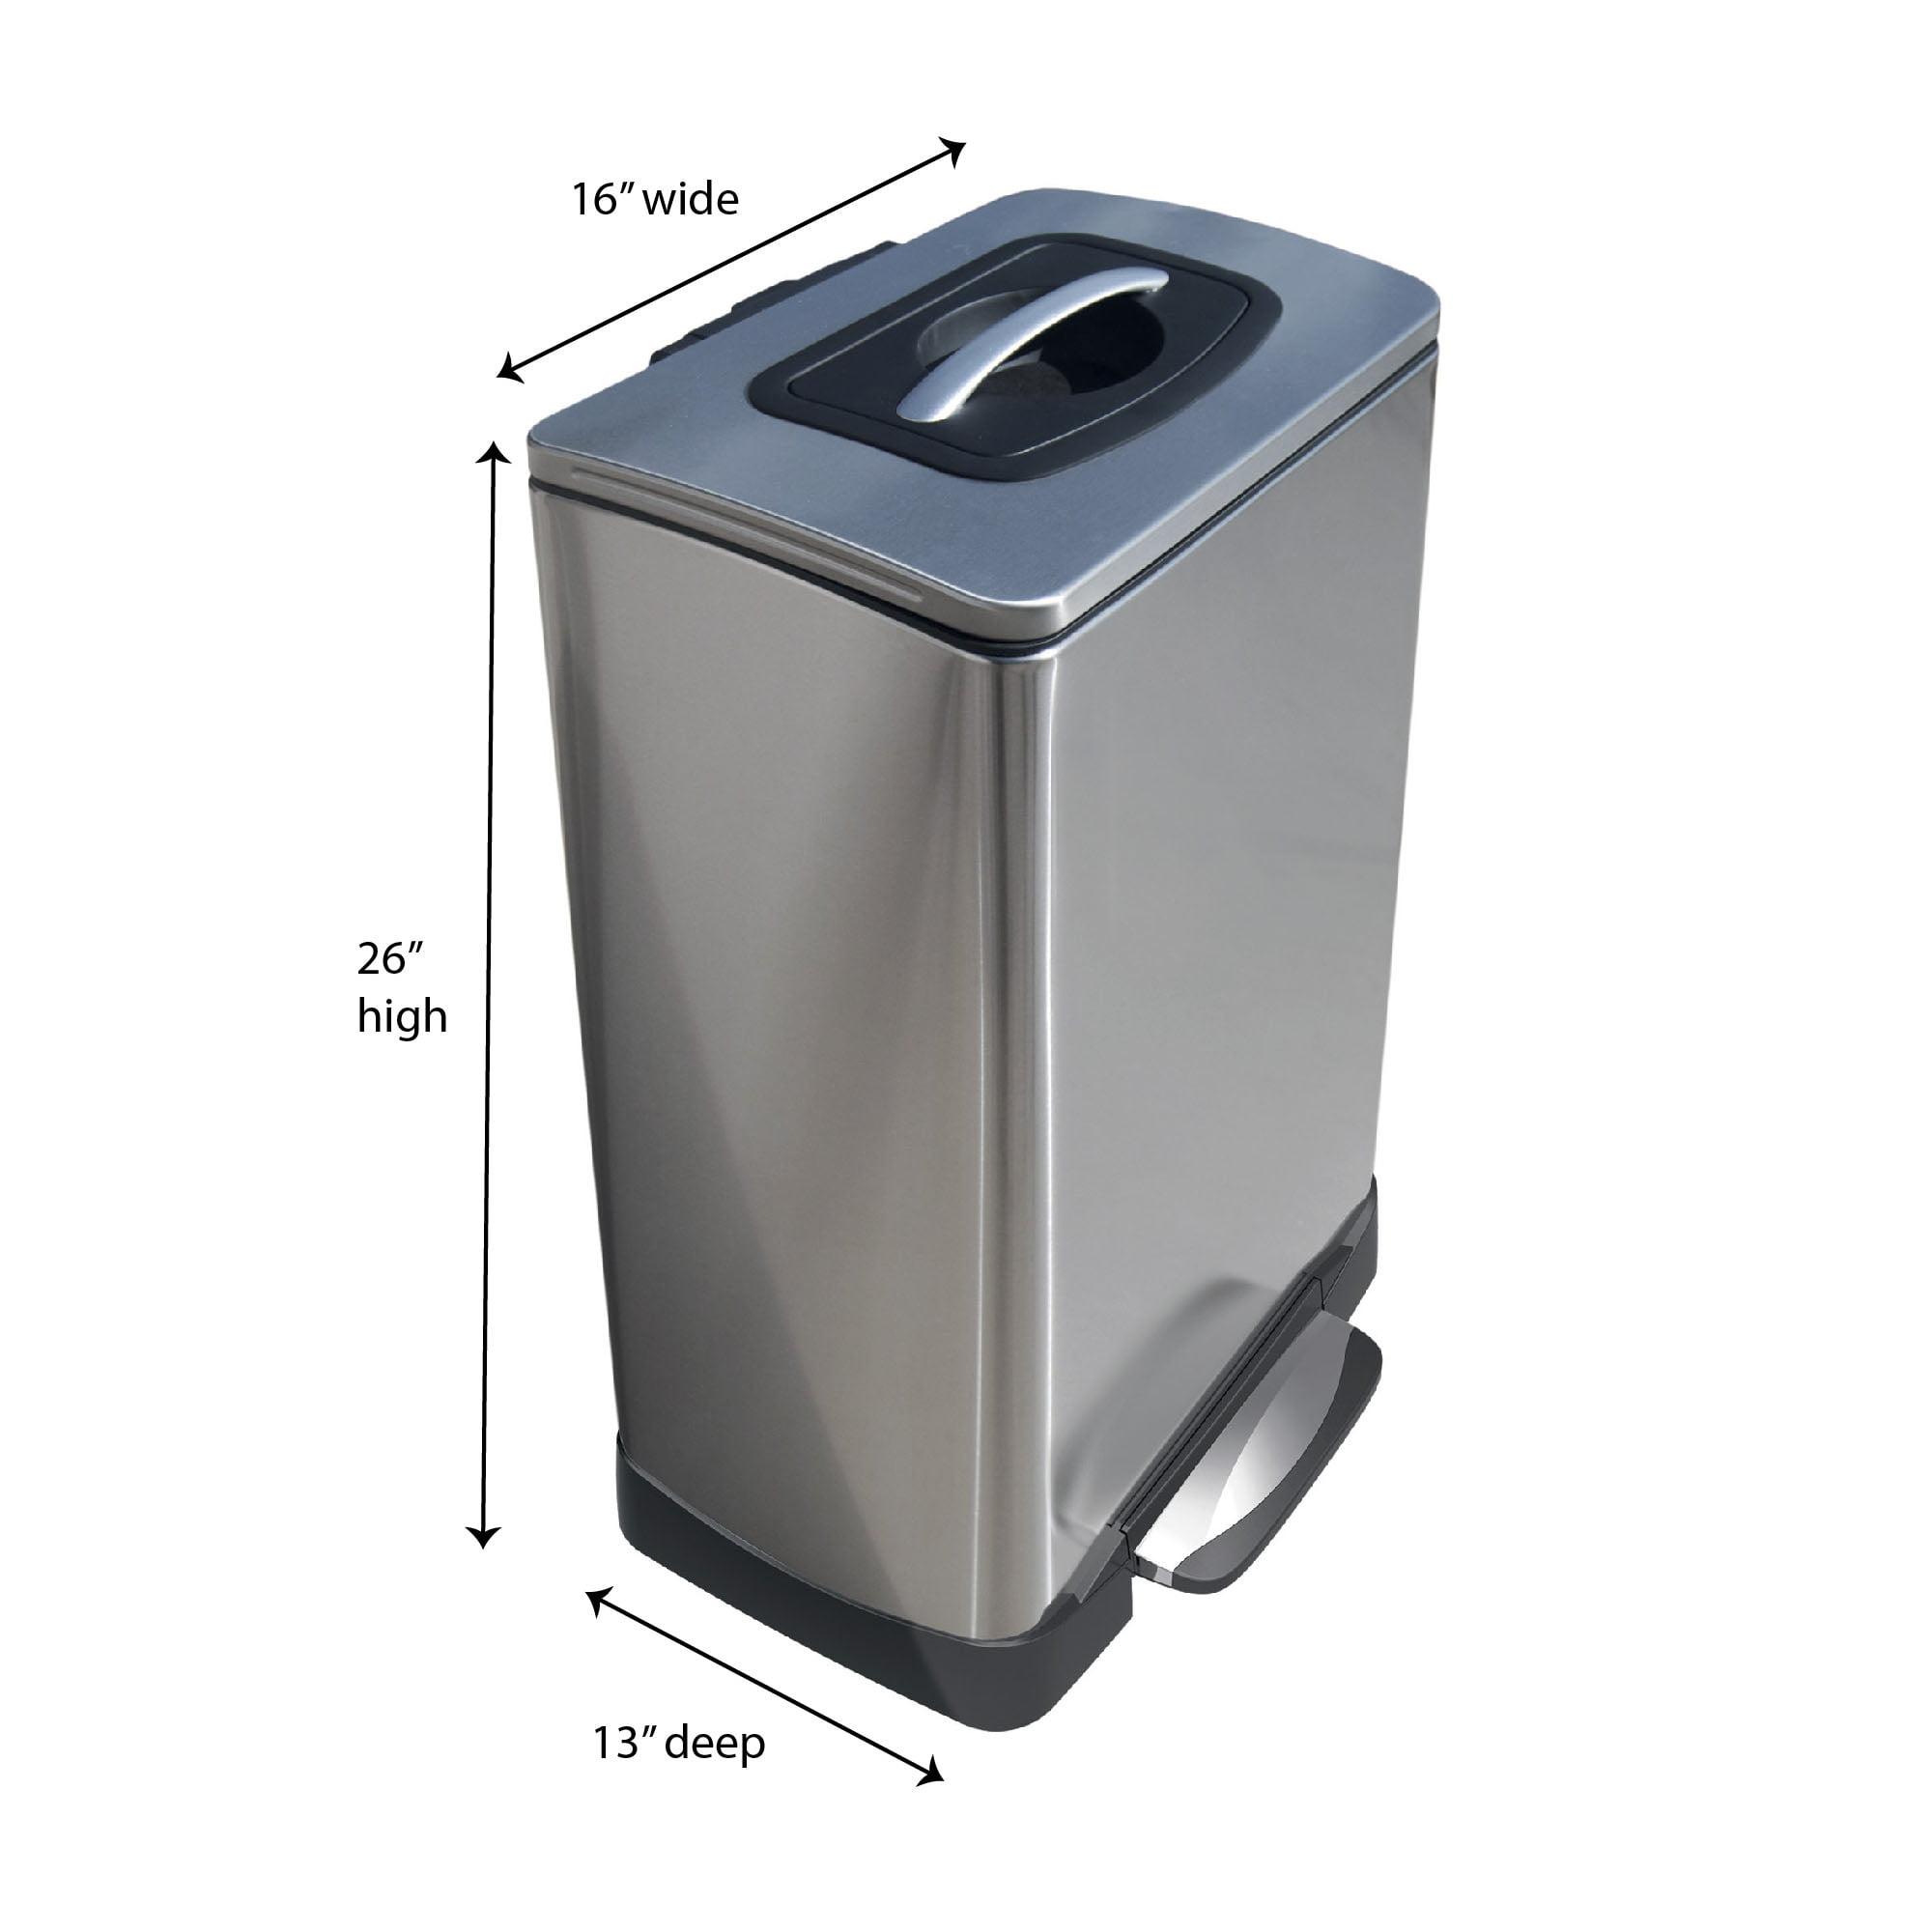 Household Essentials 40l Krusher Stainless Steel Manual Trash Compactor Trash Can Walmart Com Walmart Com